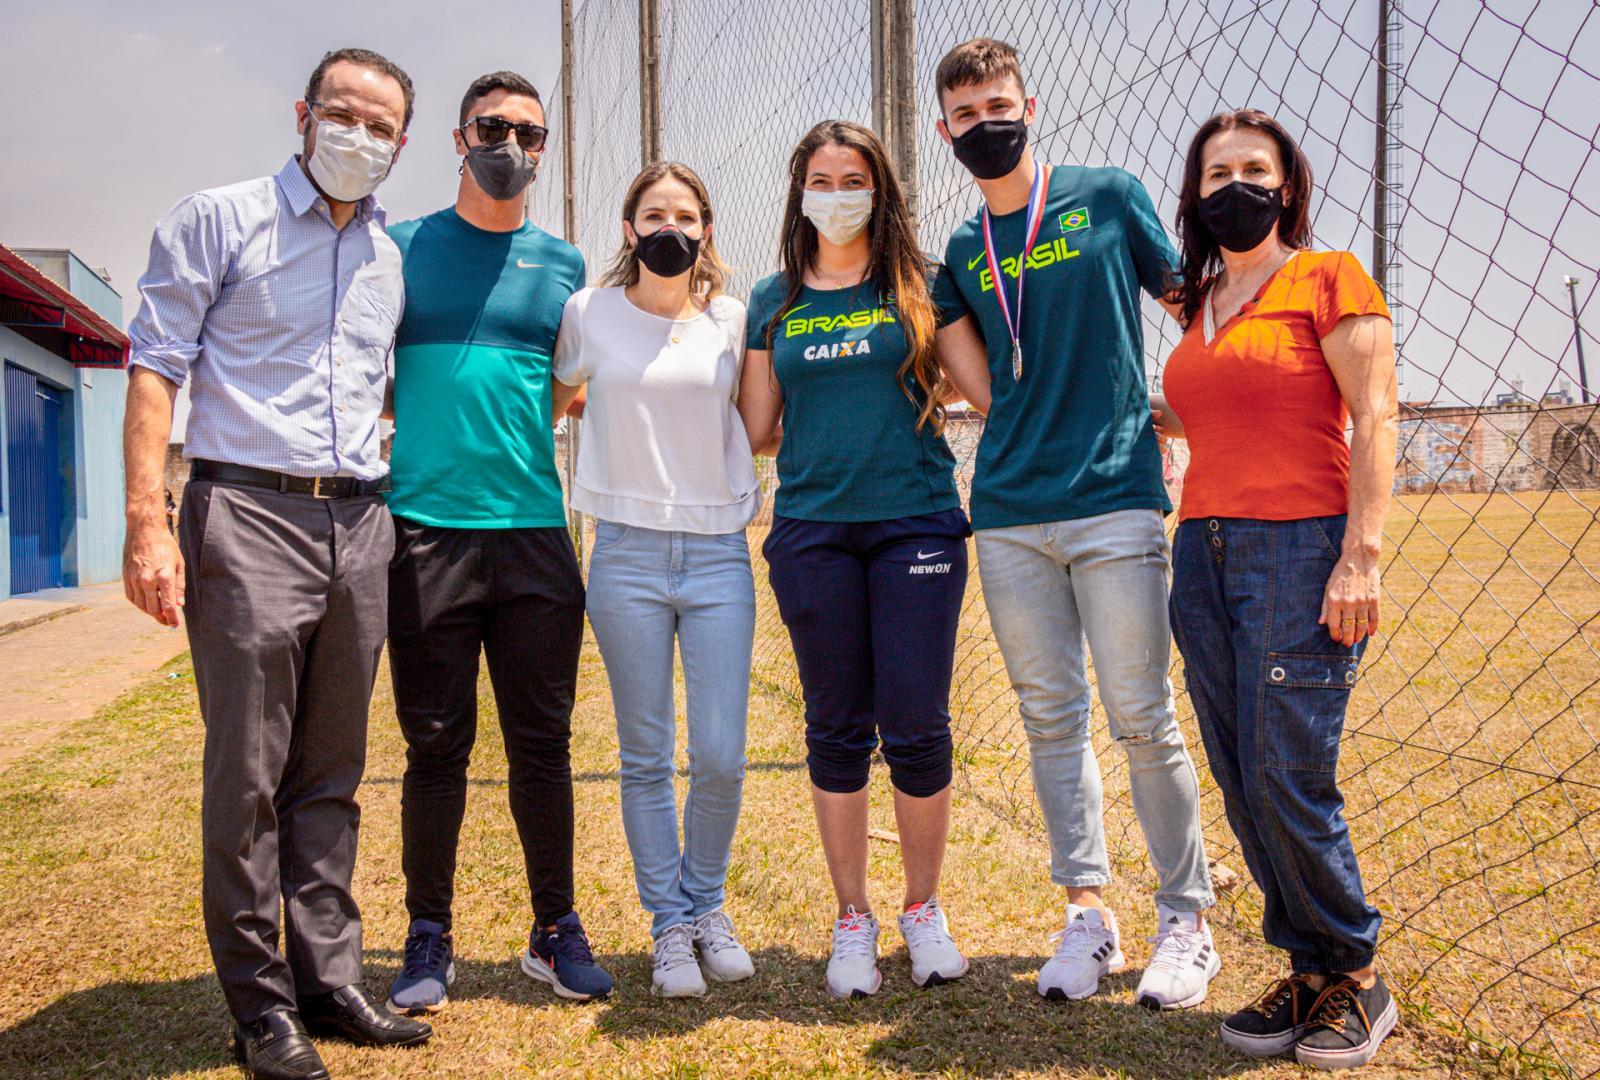 Imagem Cianortense conquista a prata no Campeonato Sul-Americano sub-18 de Atletismo